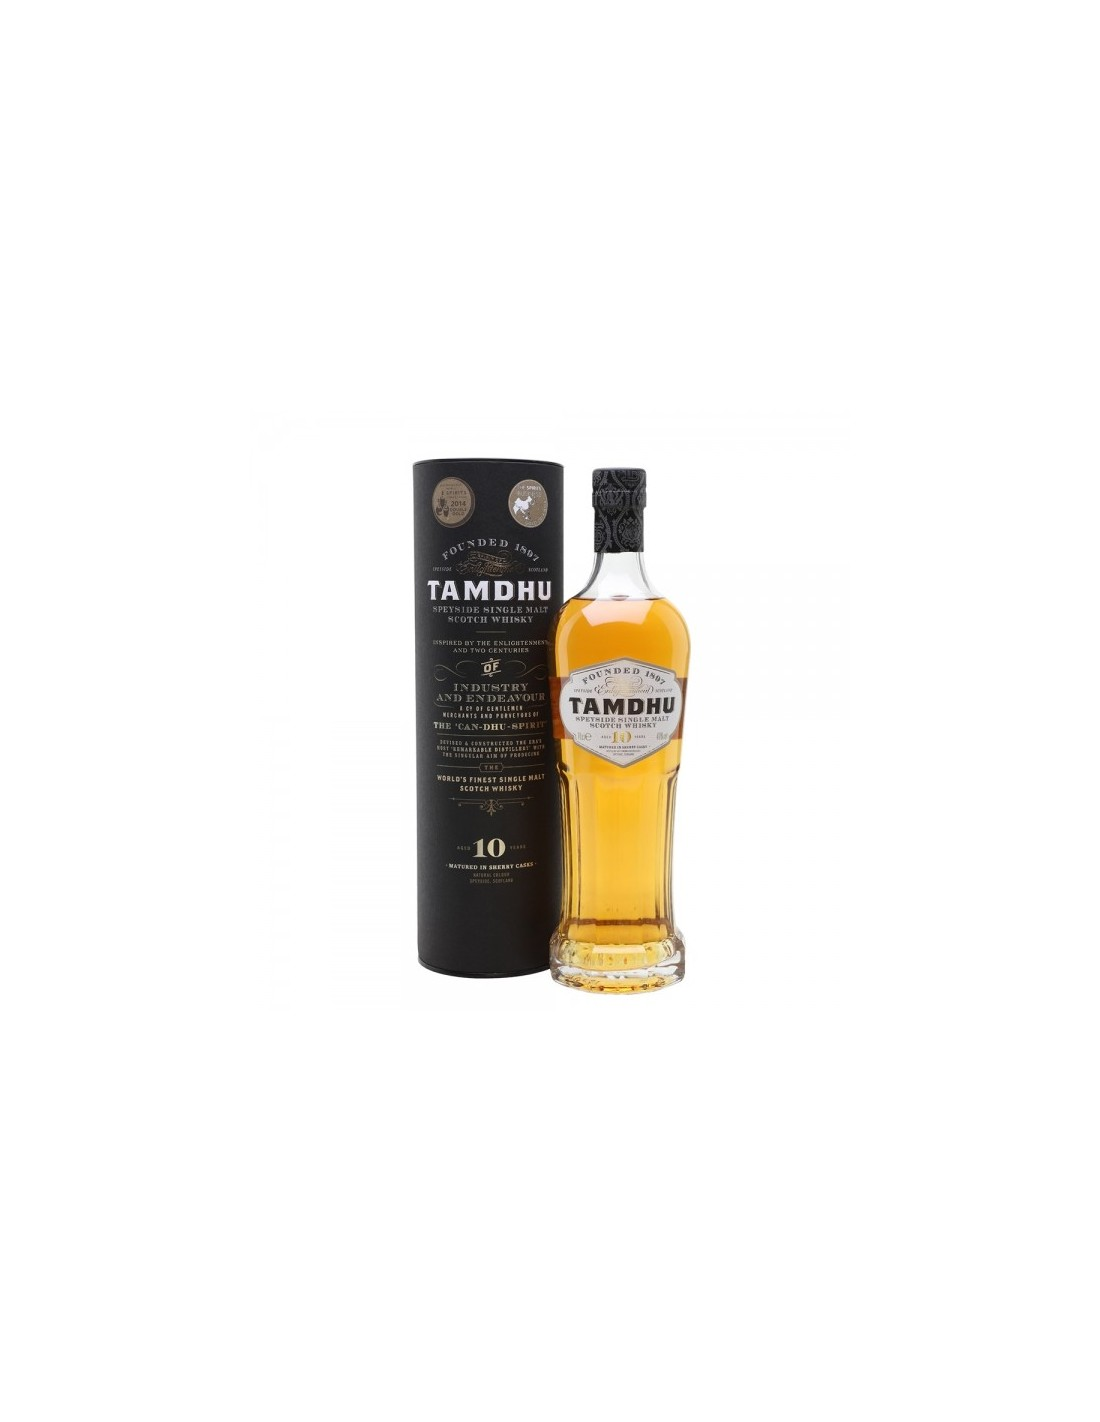 Whisky Single Malt Tamdhu, 10 ani, 40% alc., 0.7L, Scotia